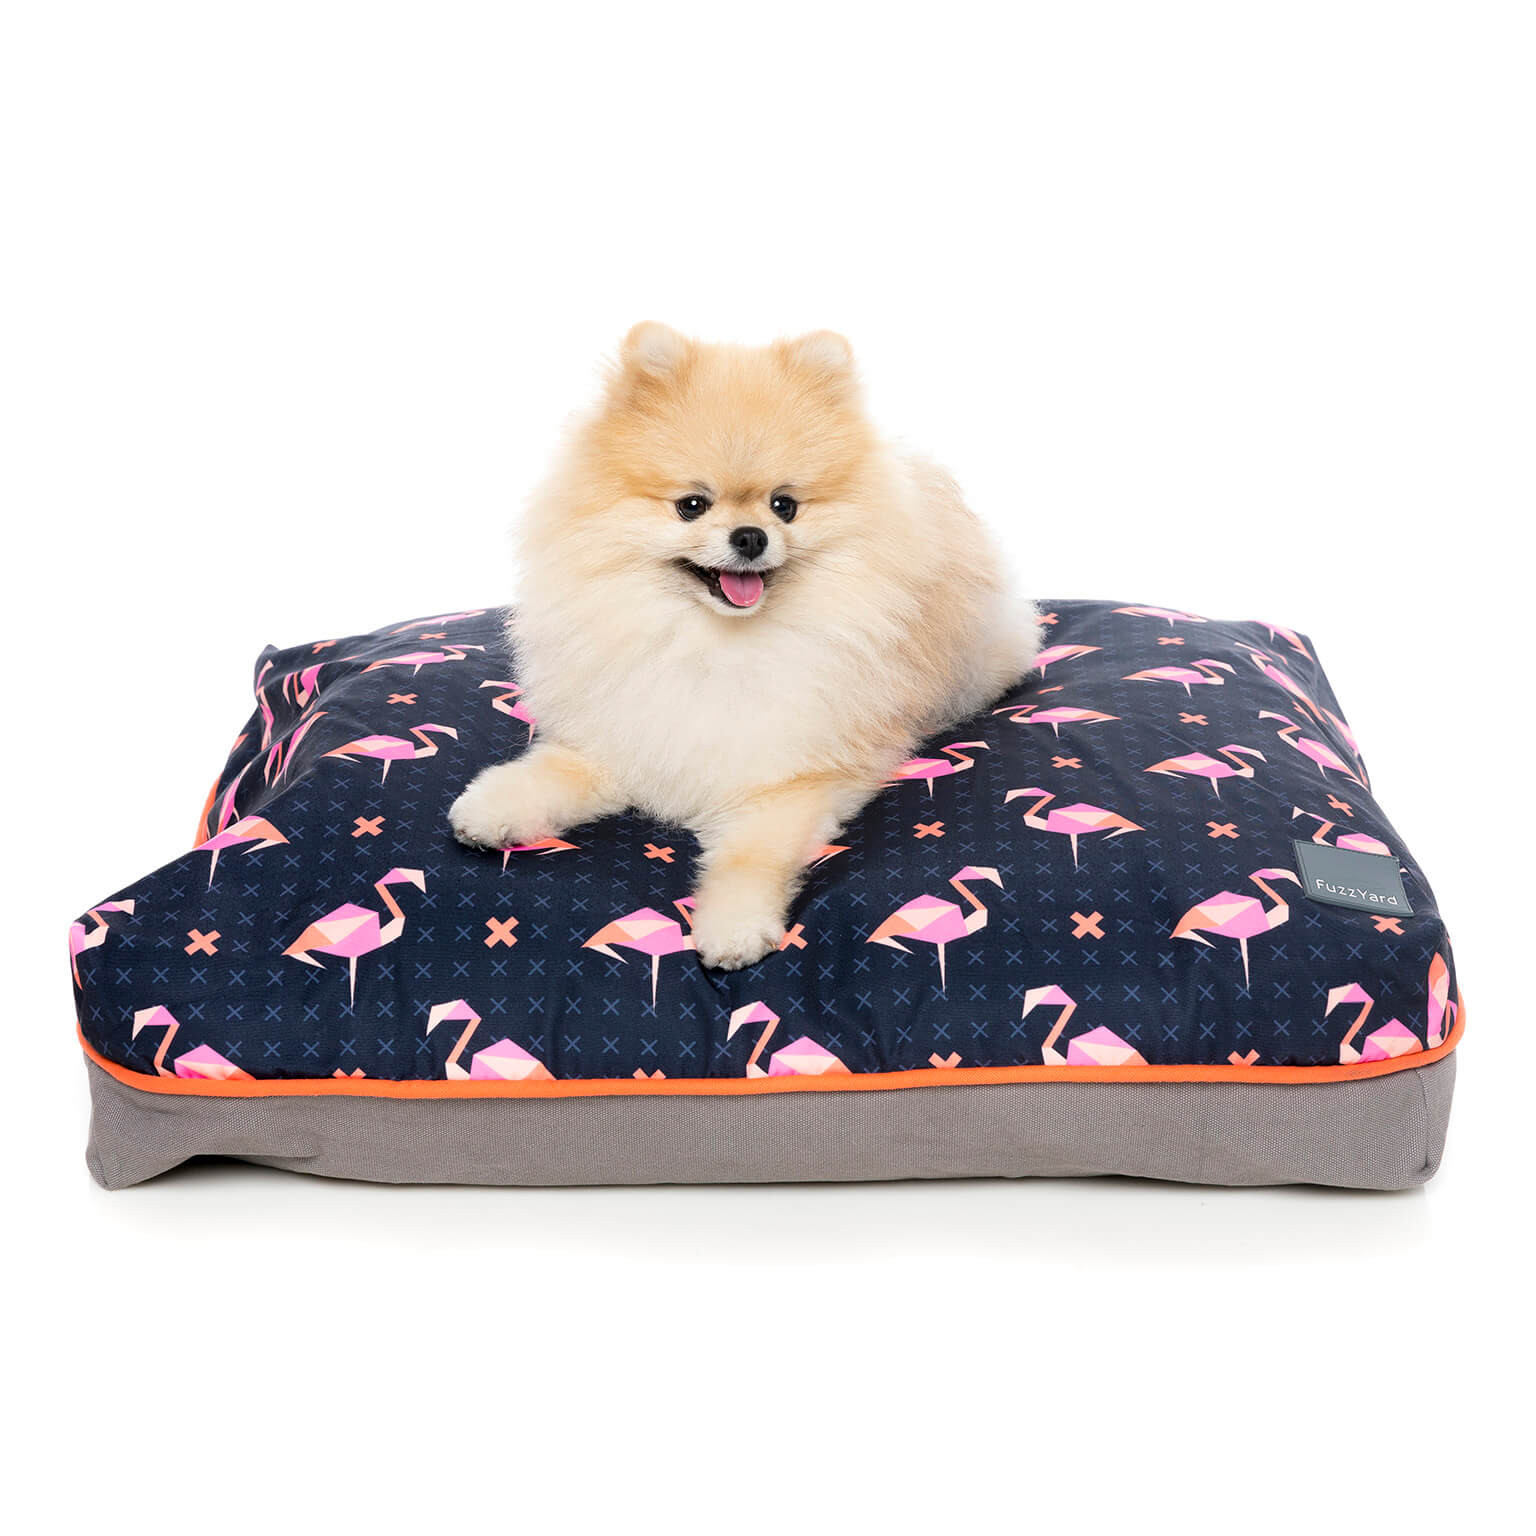 fuzzyard-bigdreamerpillow-fabmingo-dog-1.jpg